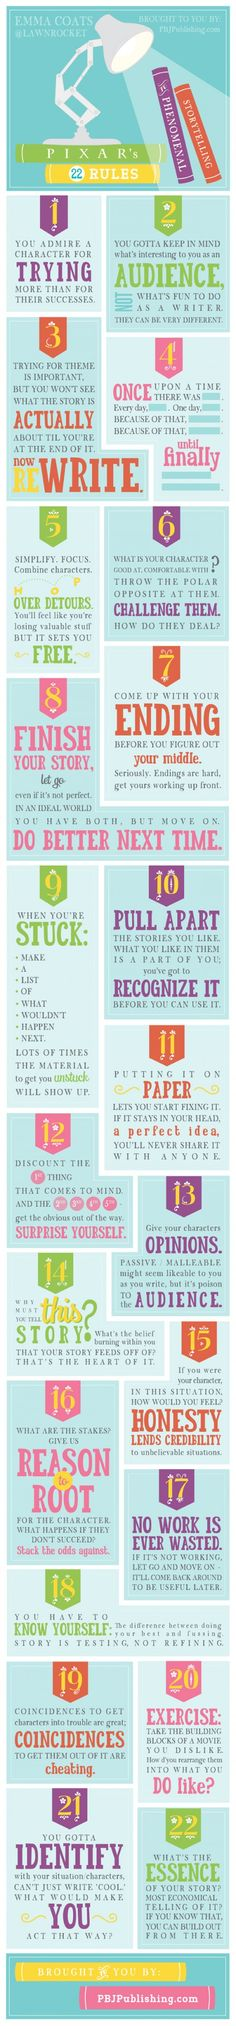 Pixar's 22 Rules to Phenomenal #Storytelling [INFOGRAPHIC]